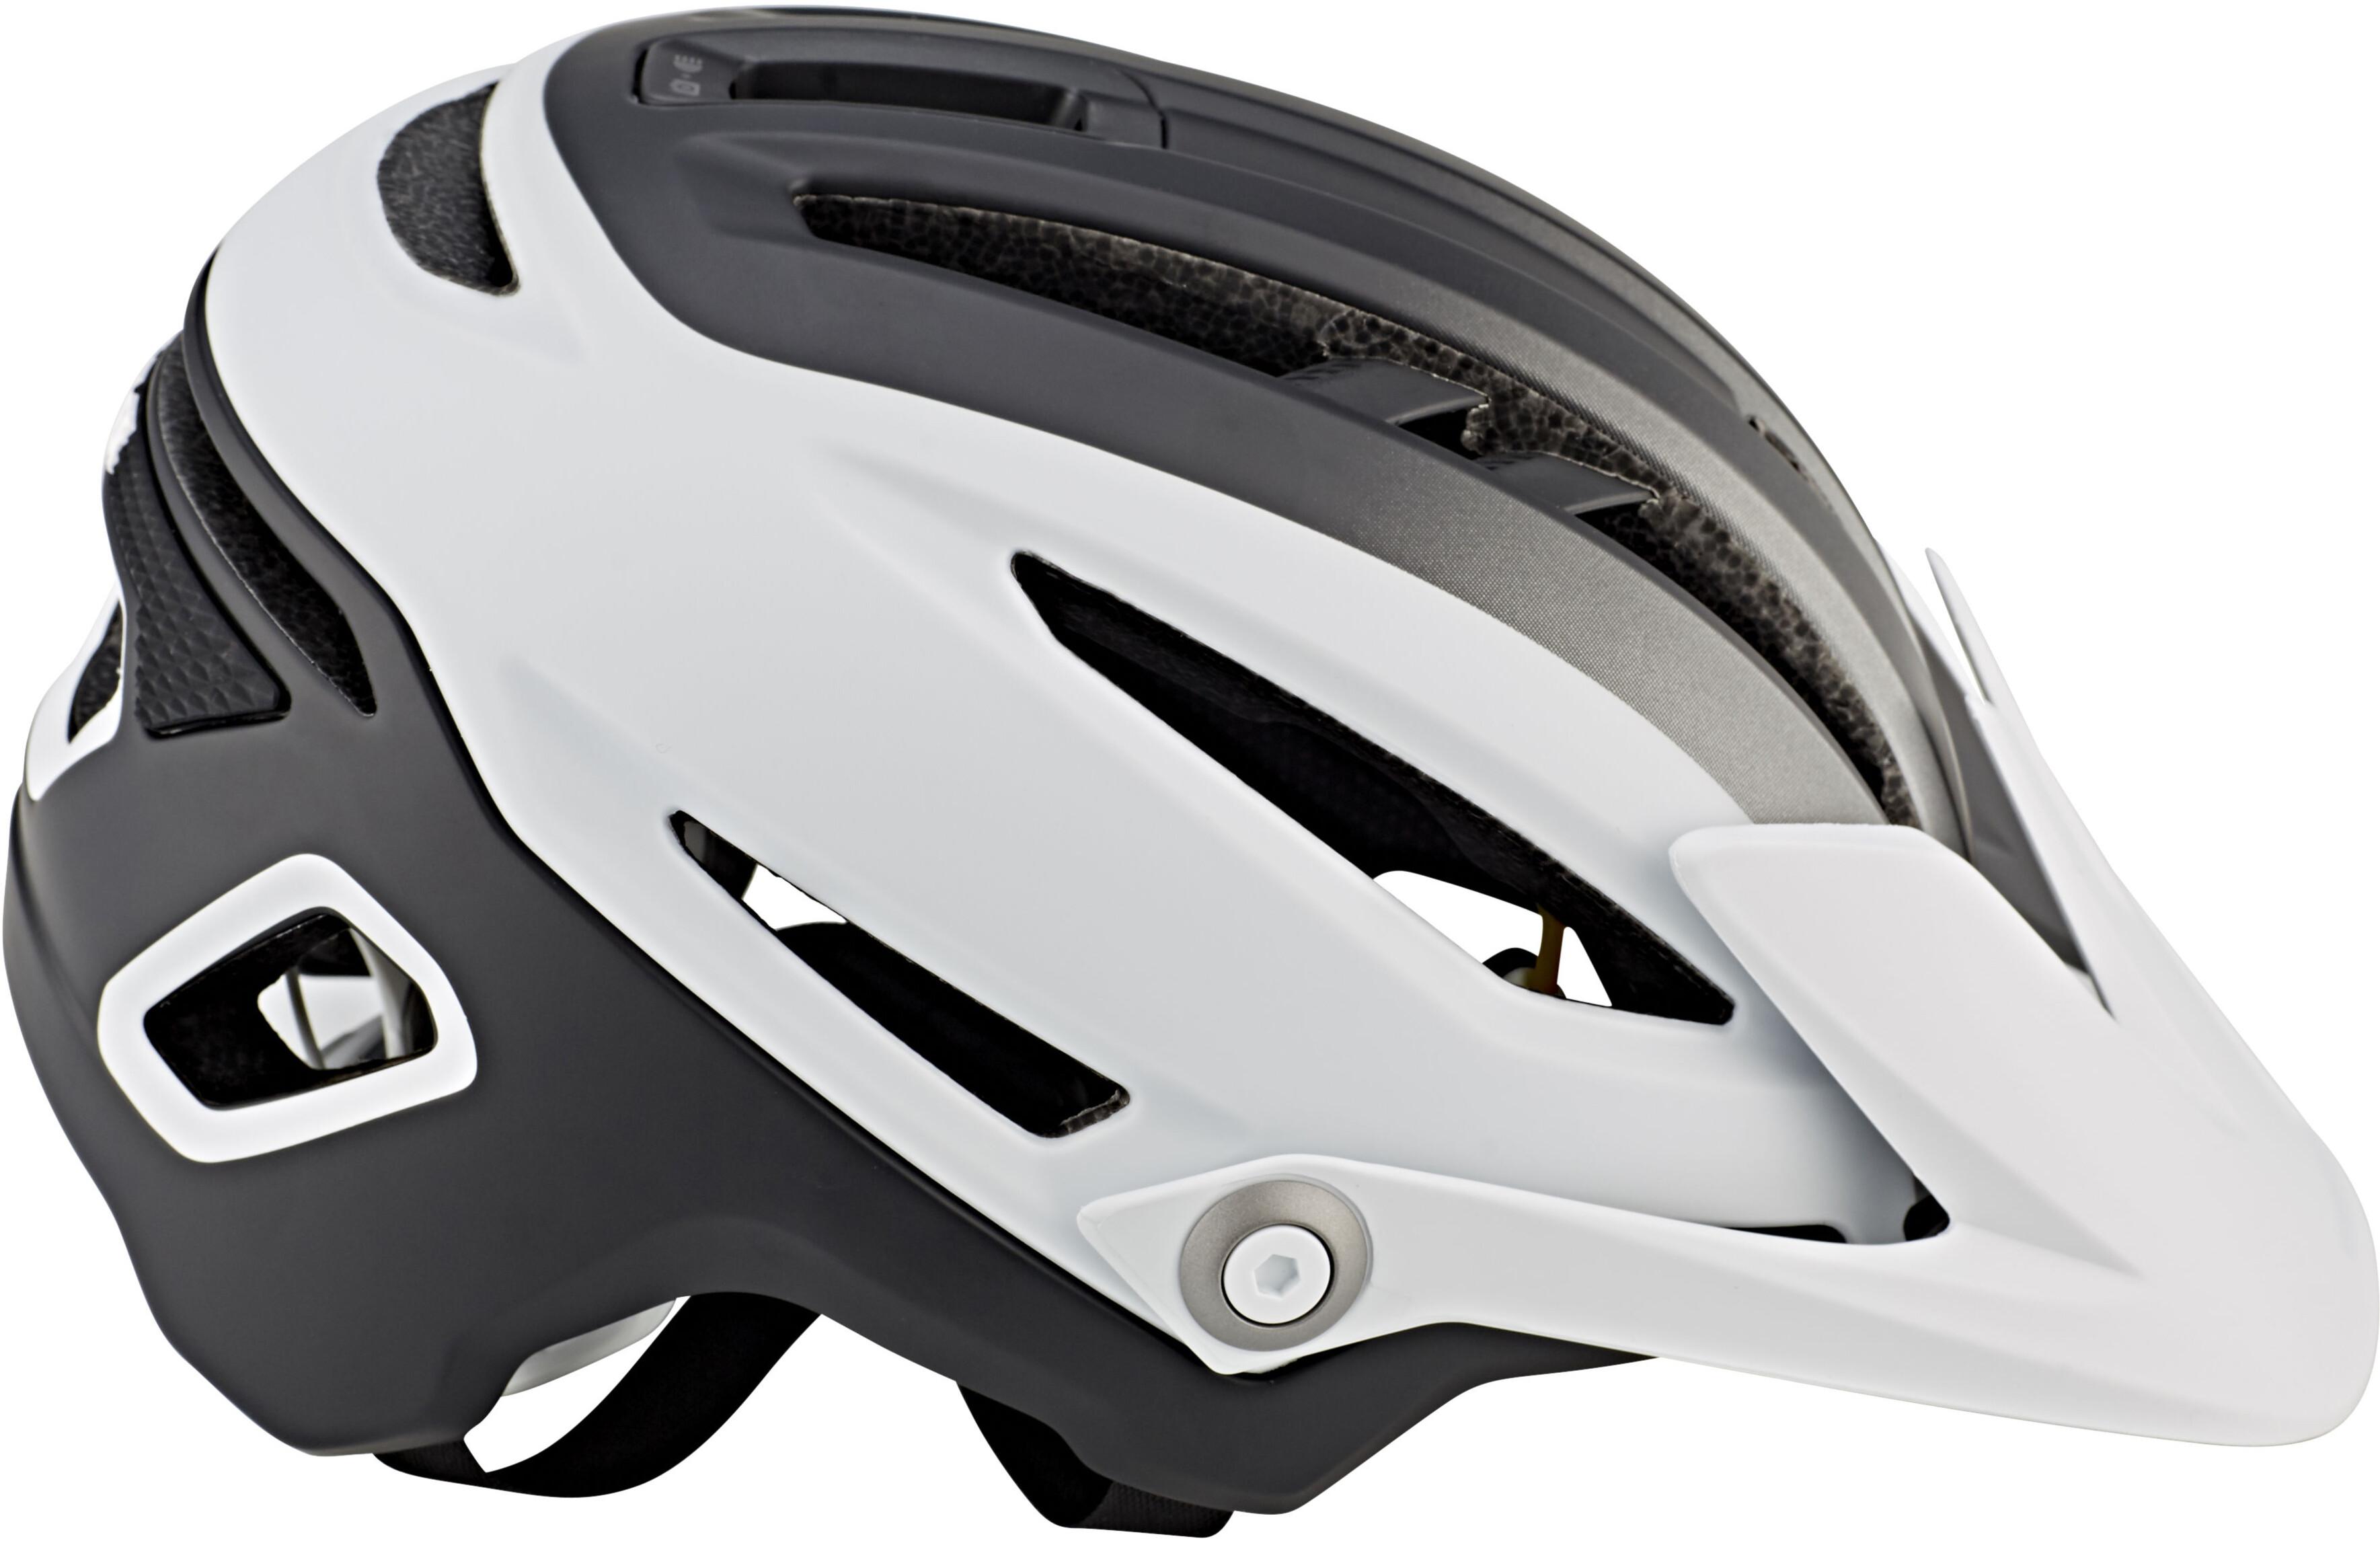 bell sixer mips mtb helmet matte white black online kaufen. Black Bedroom Furniture Sets. Home Design Ideas